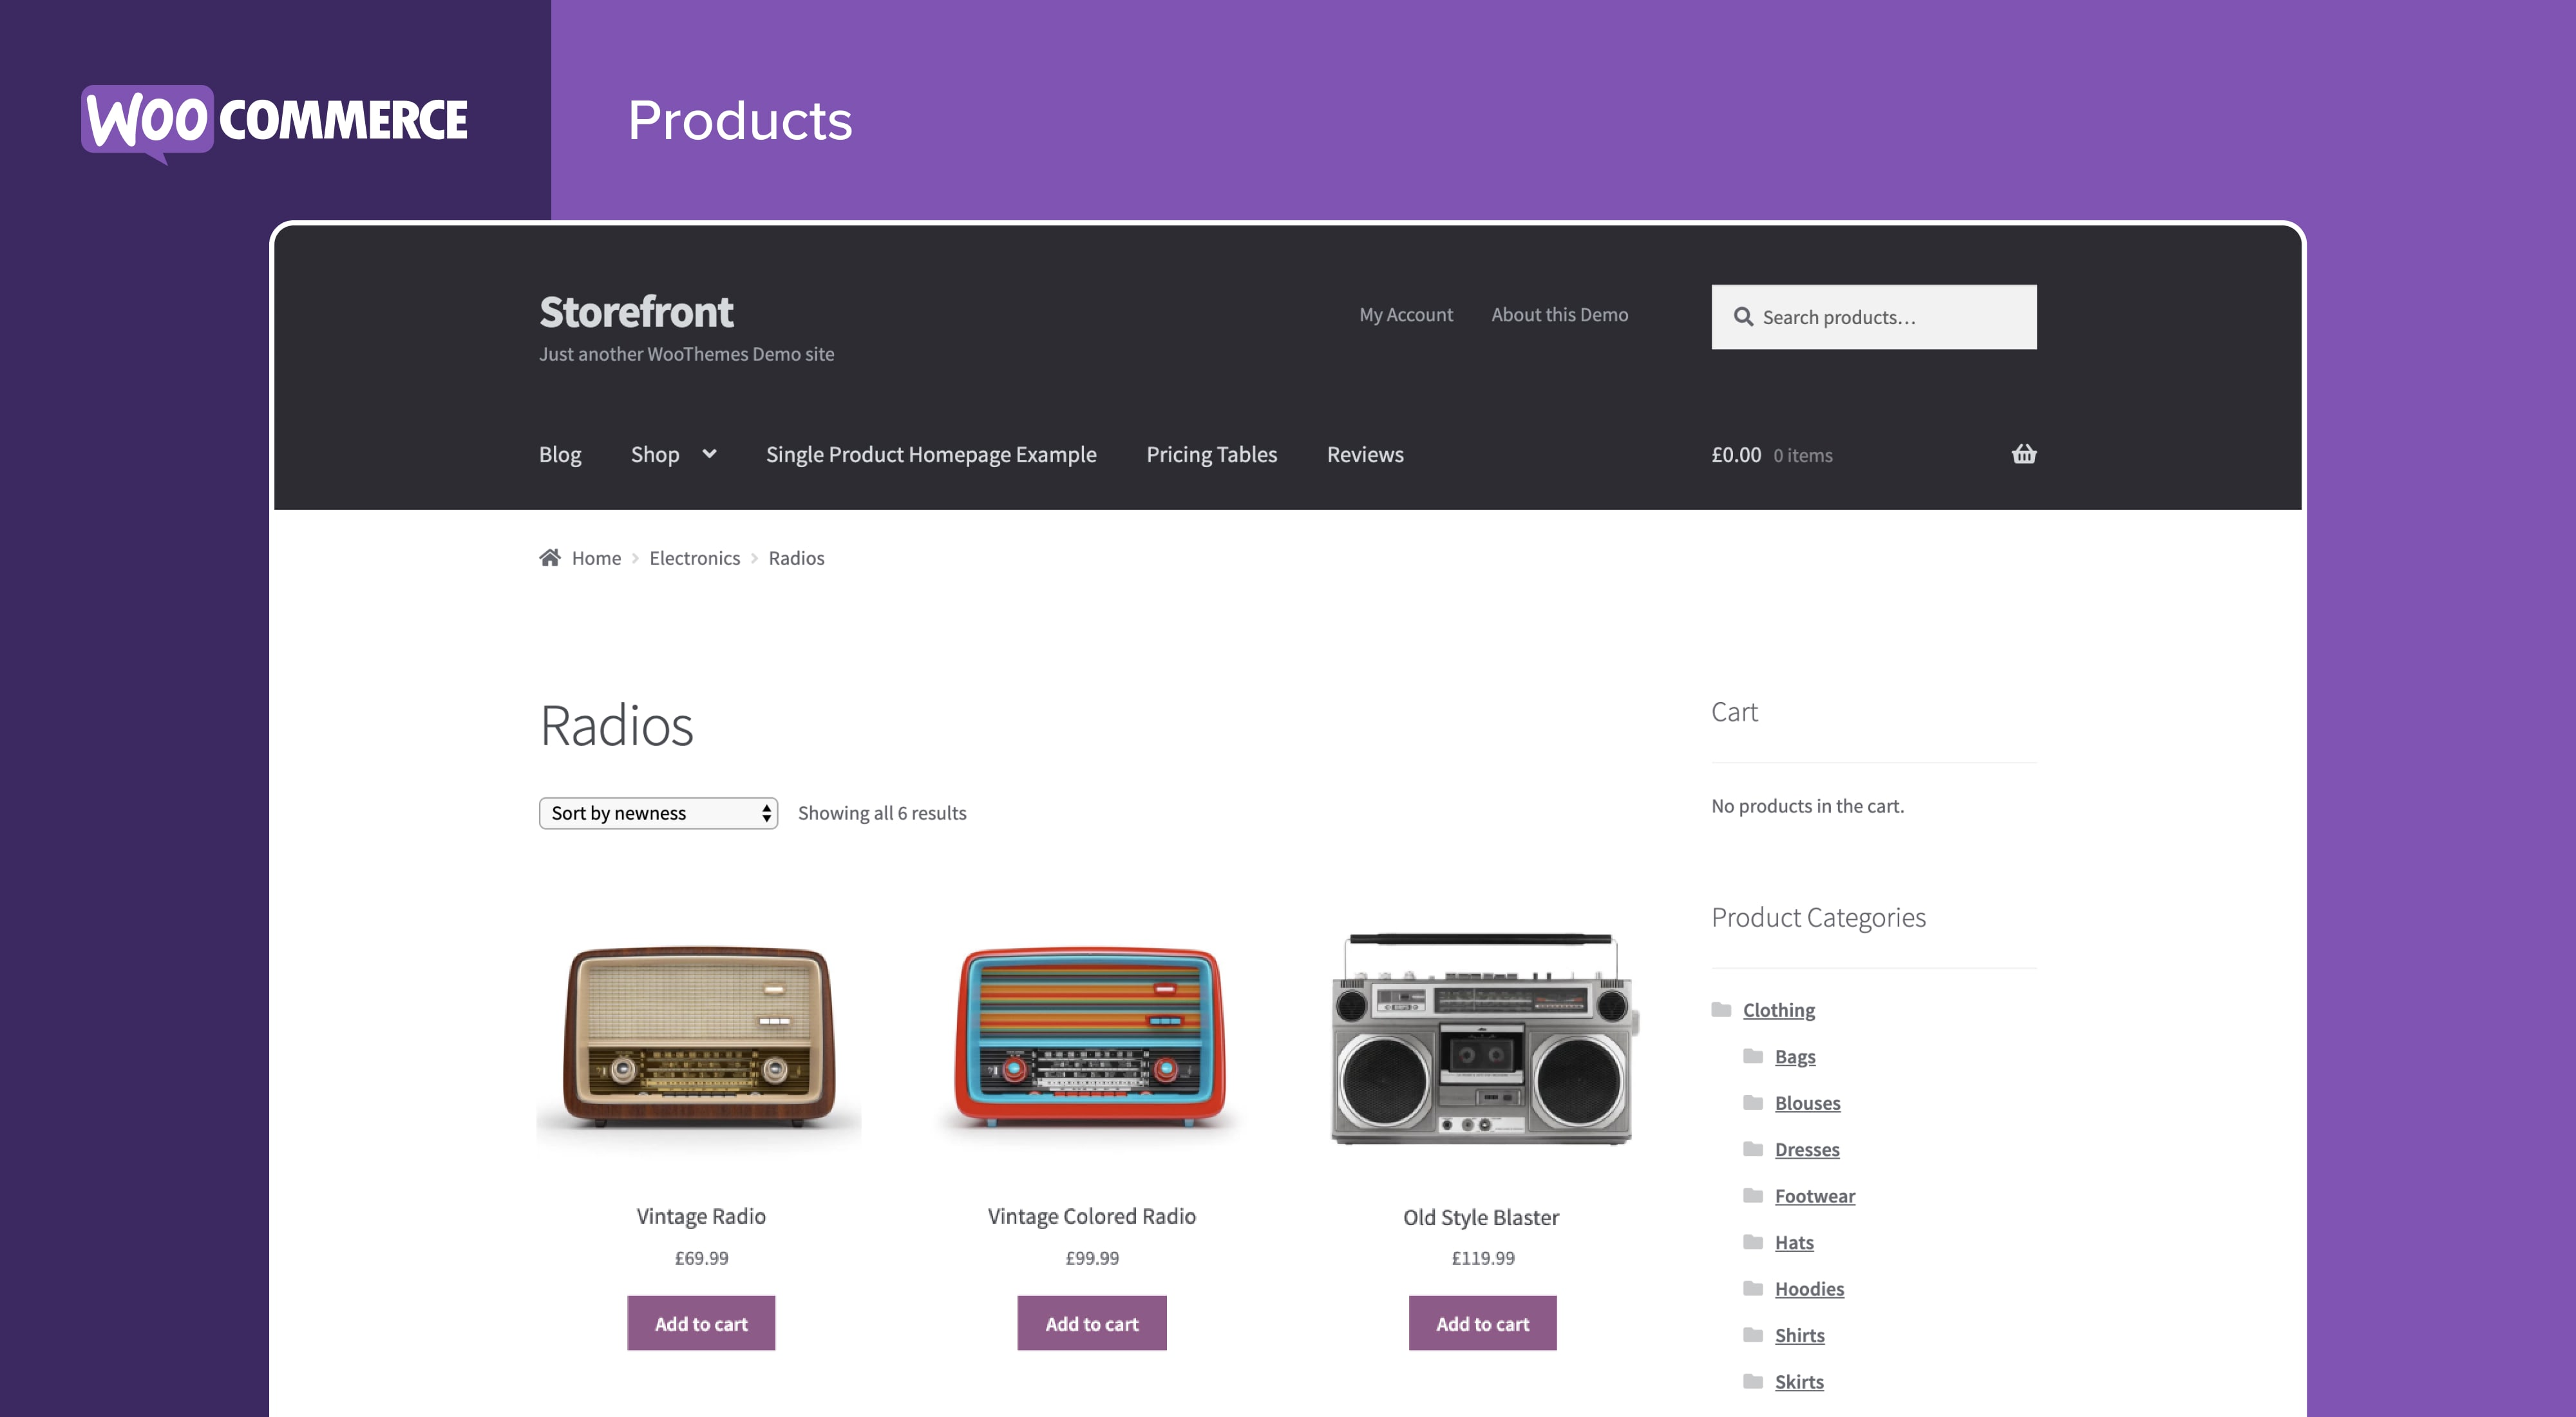 WooCommerce Loja Virtual em Wordpress, WooCommerce Loja Virtual em WordPress